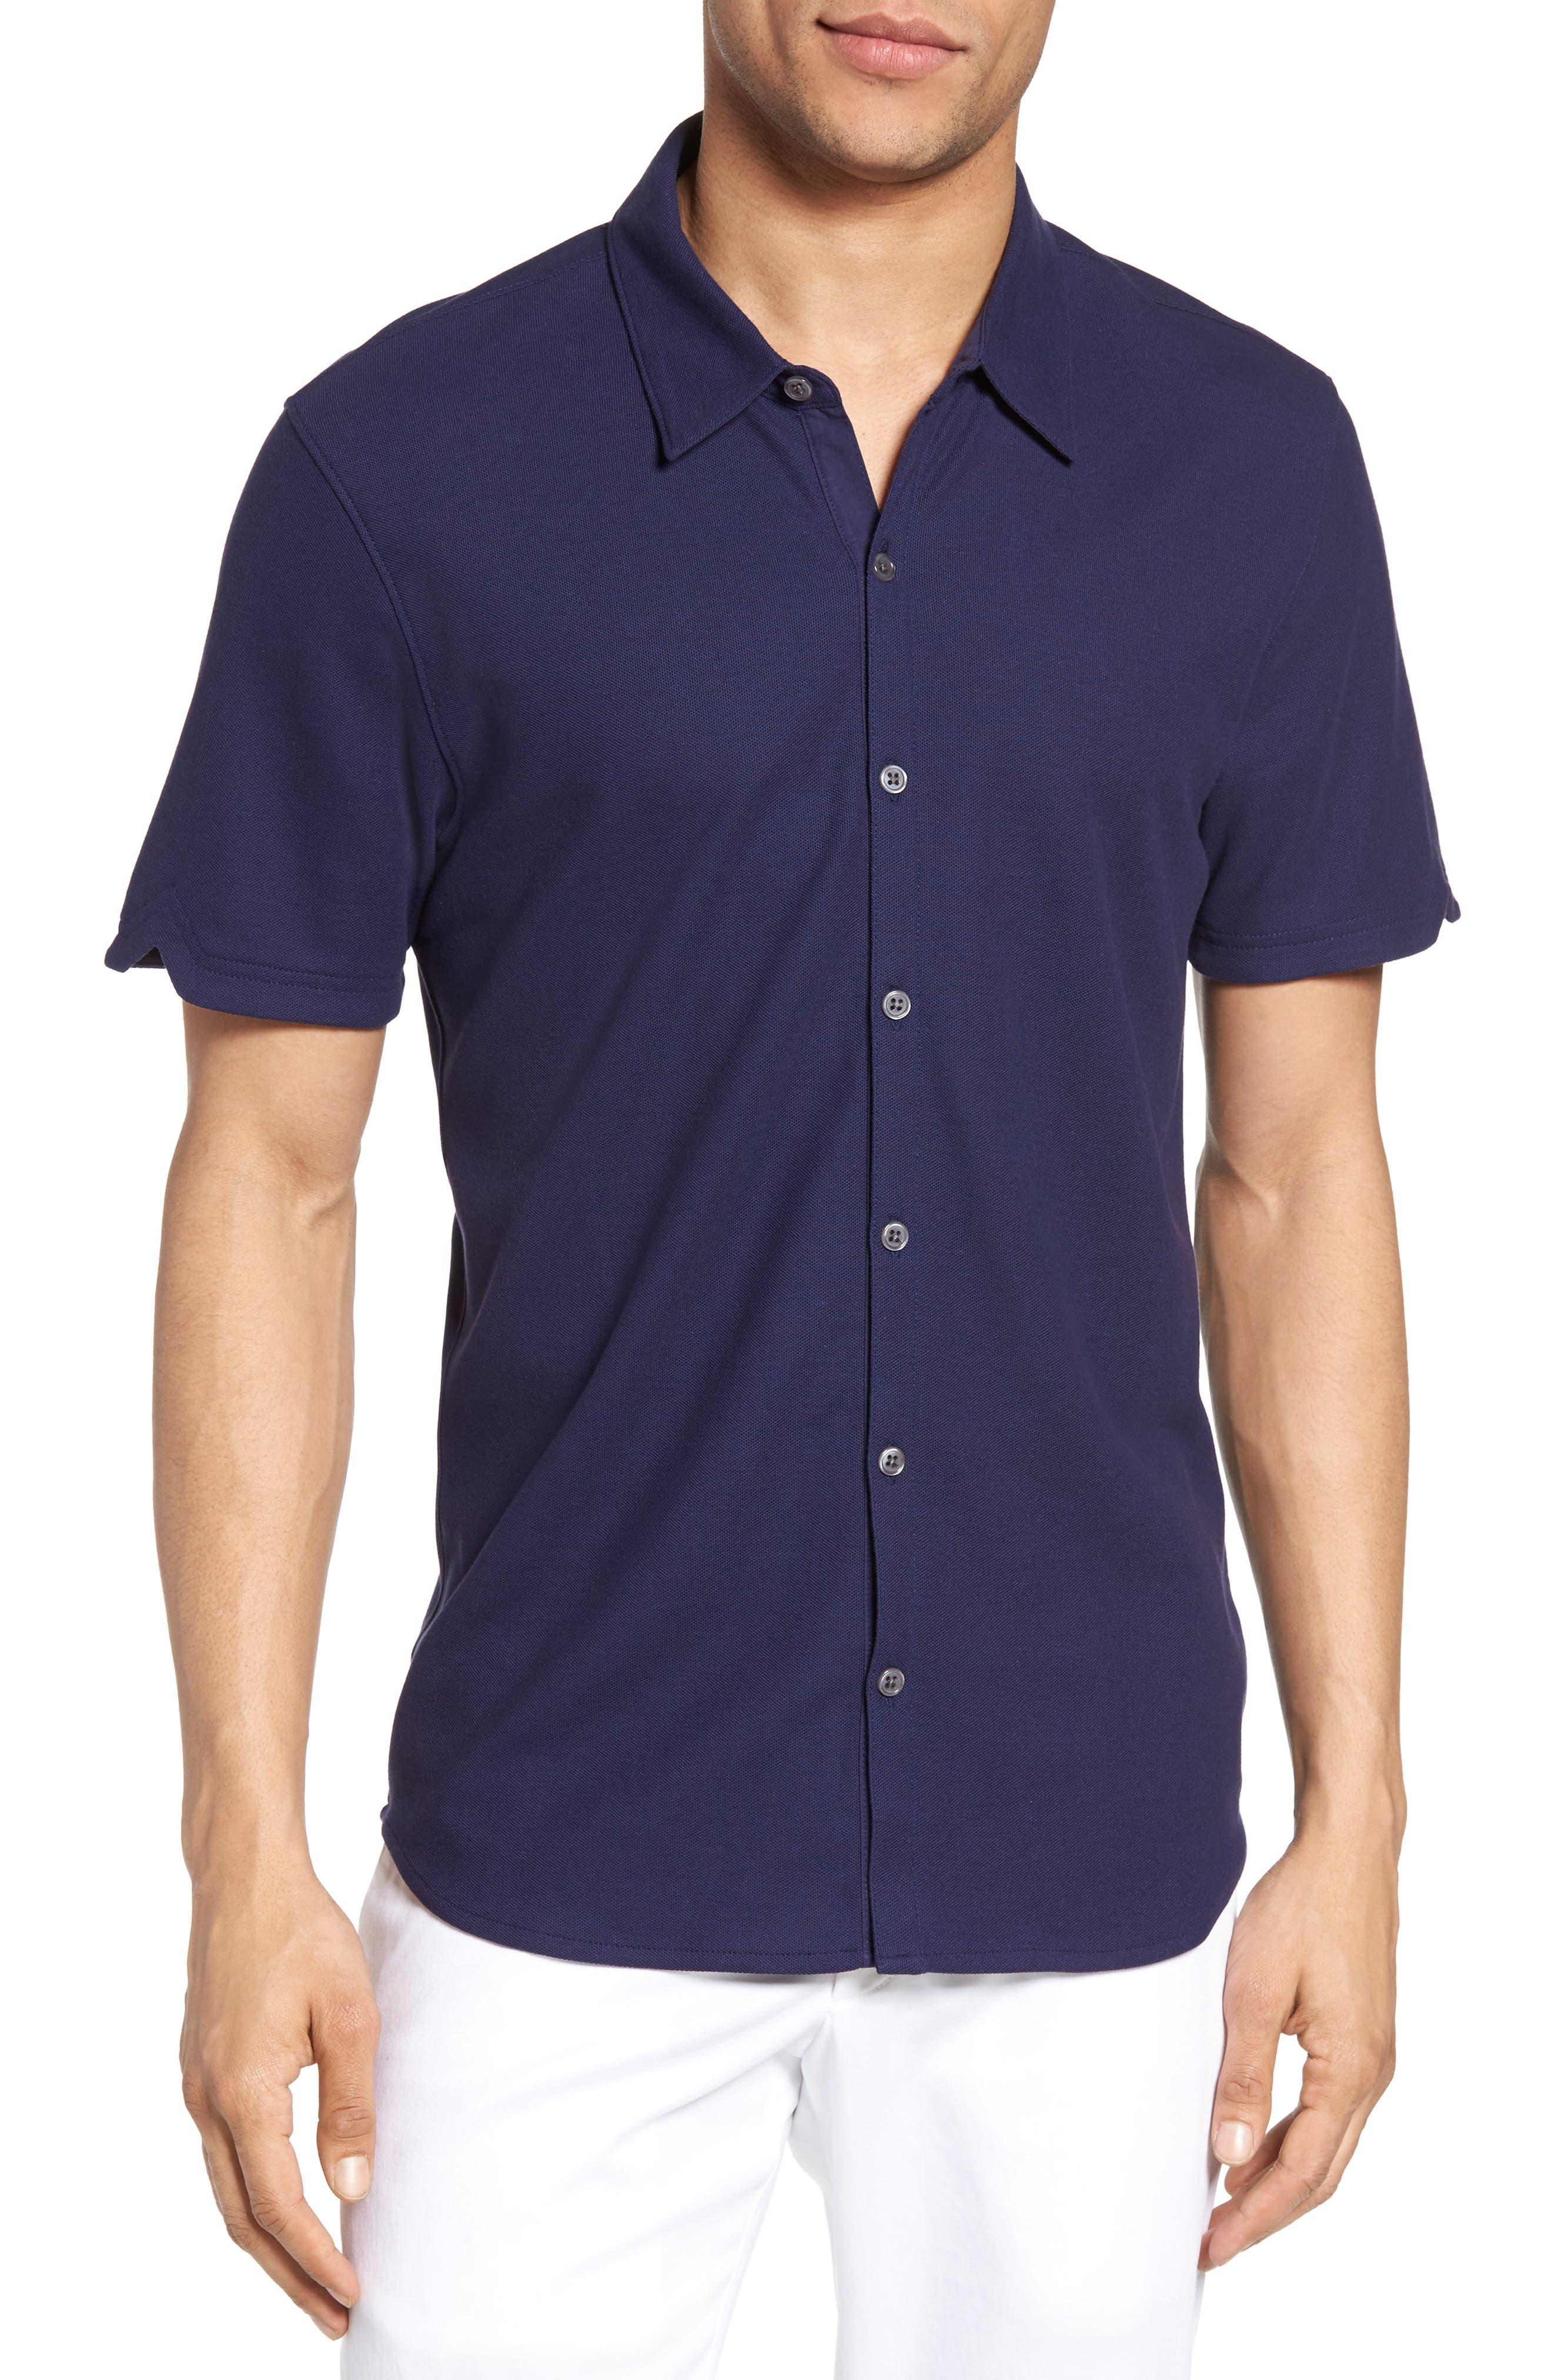 Alternate Image 1 Selected - Zachary Prell Palmetto Pima Cotton Shirt